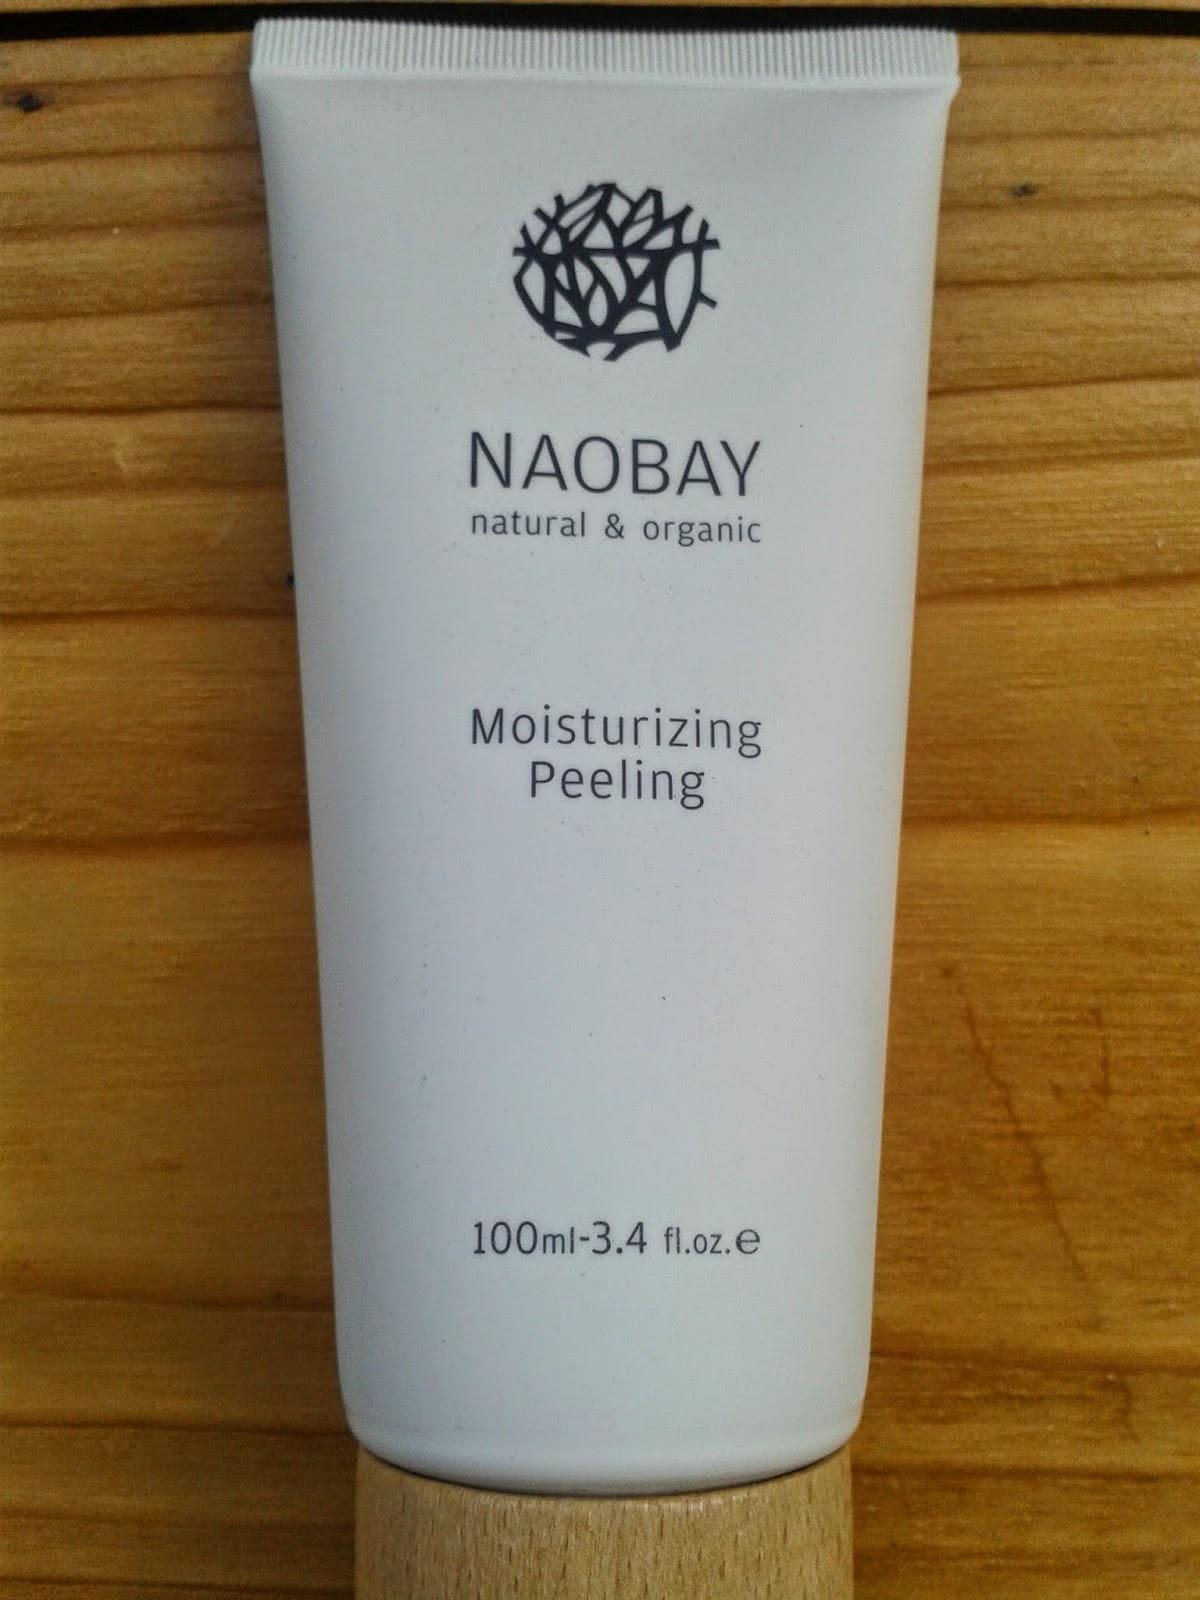 Naobay Moisturizing Peeling